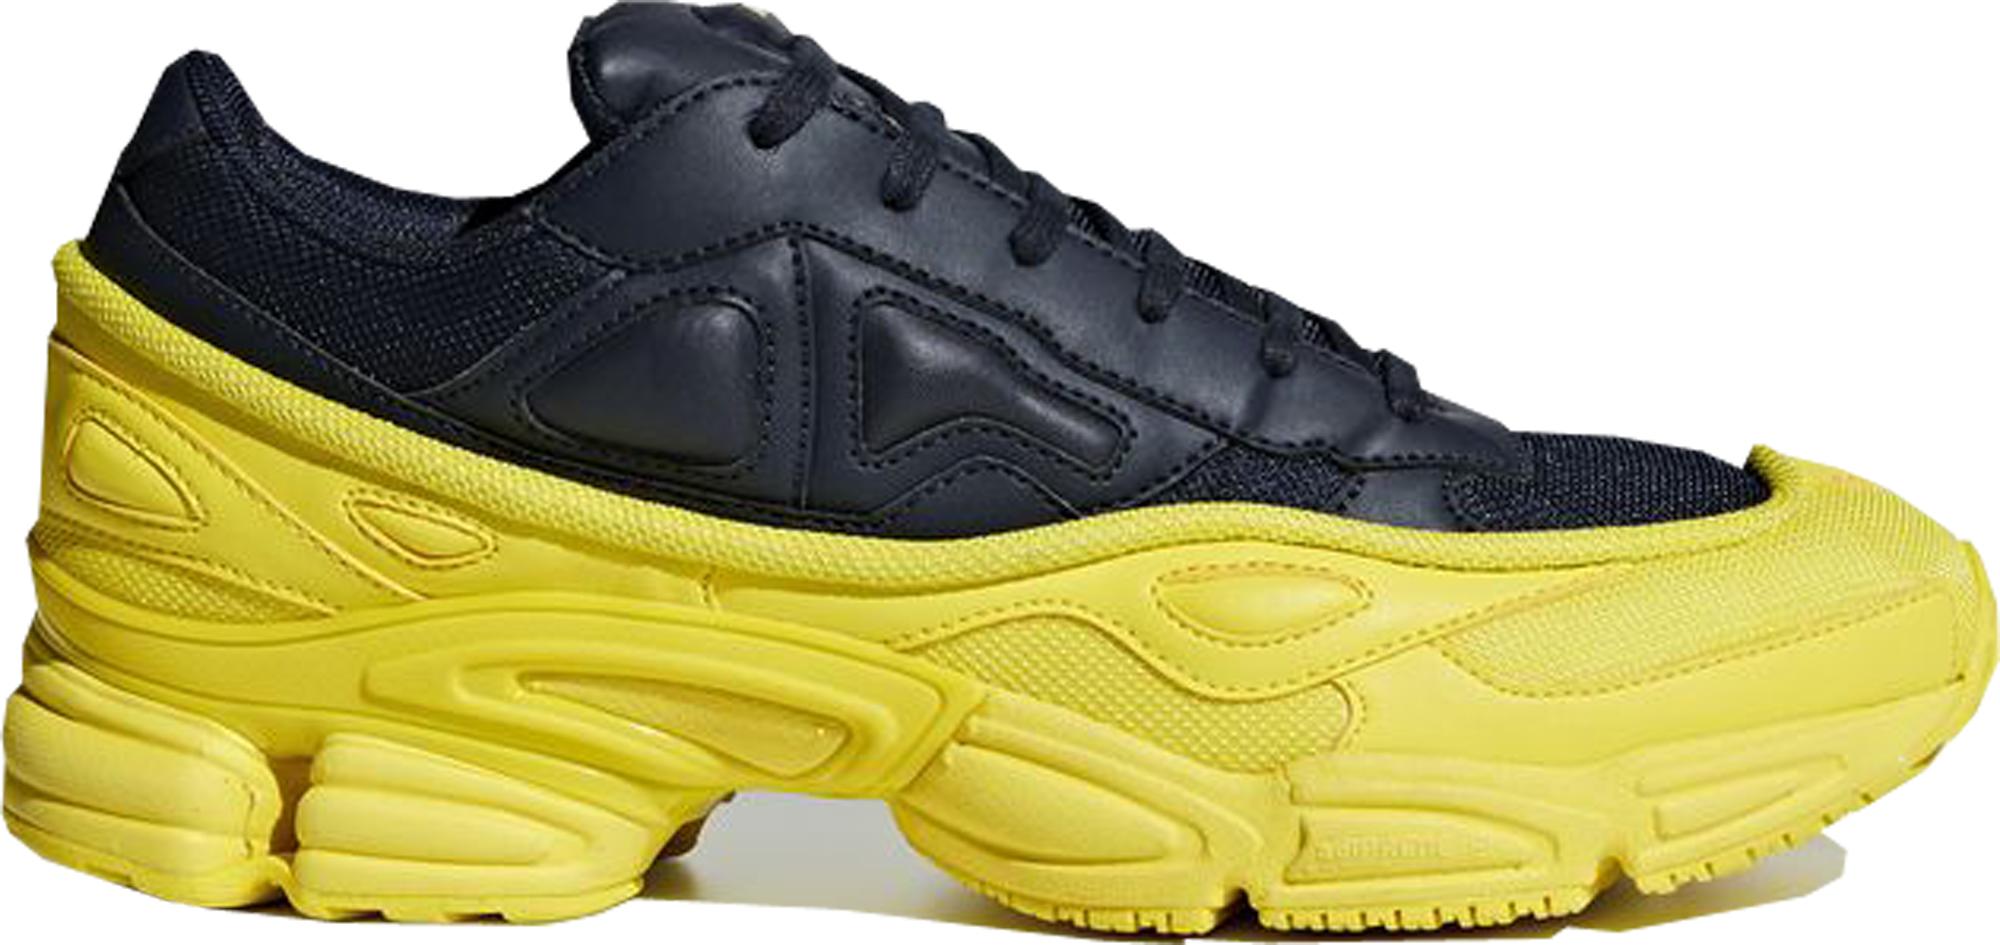 adidas Ozweego Raf Simons Bright Yellow Night Navy